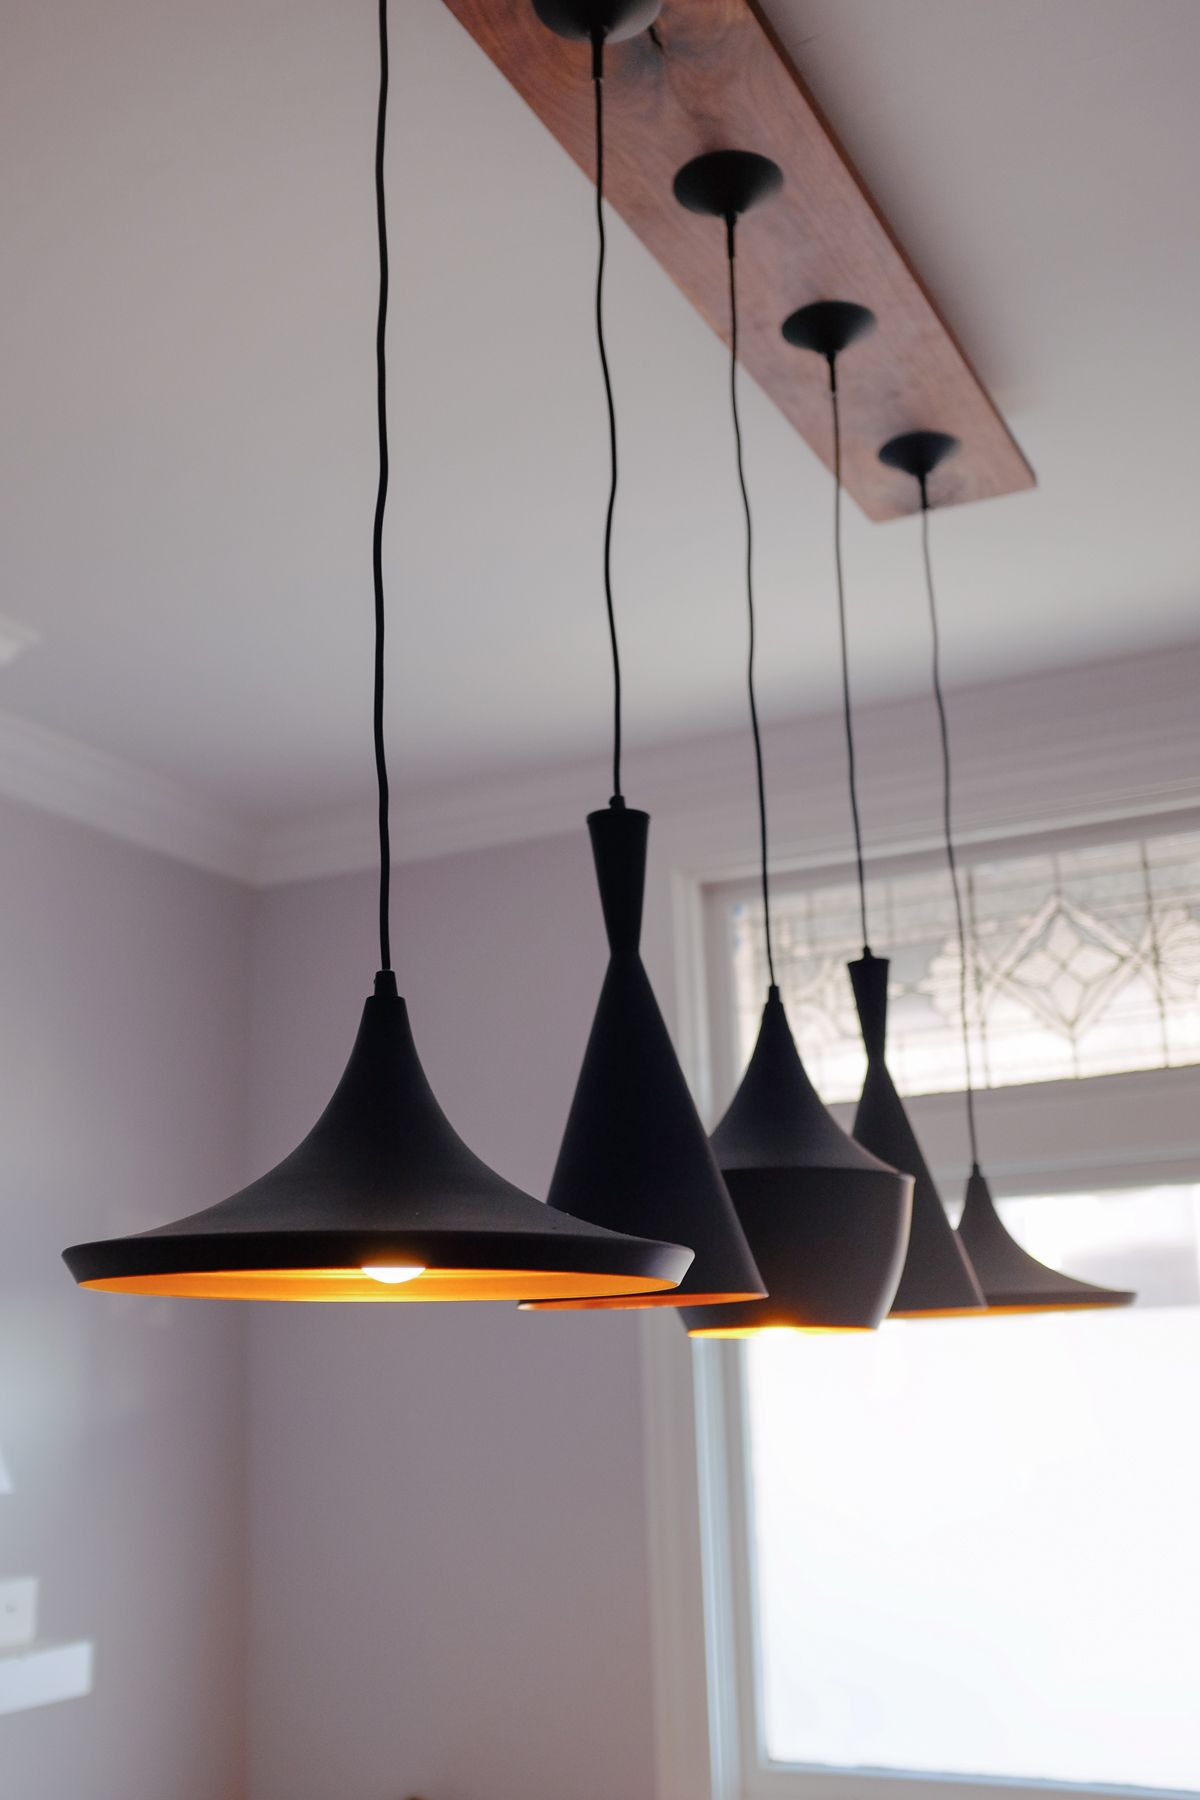 Diy pendant light canopy diy pendant light diy hanging